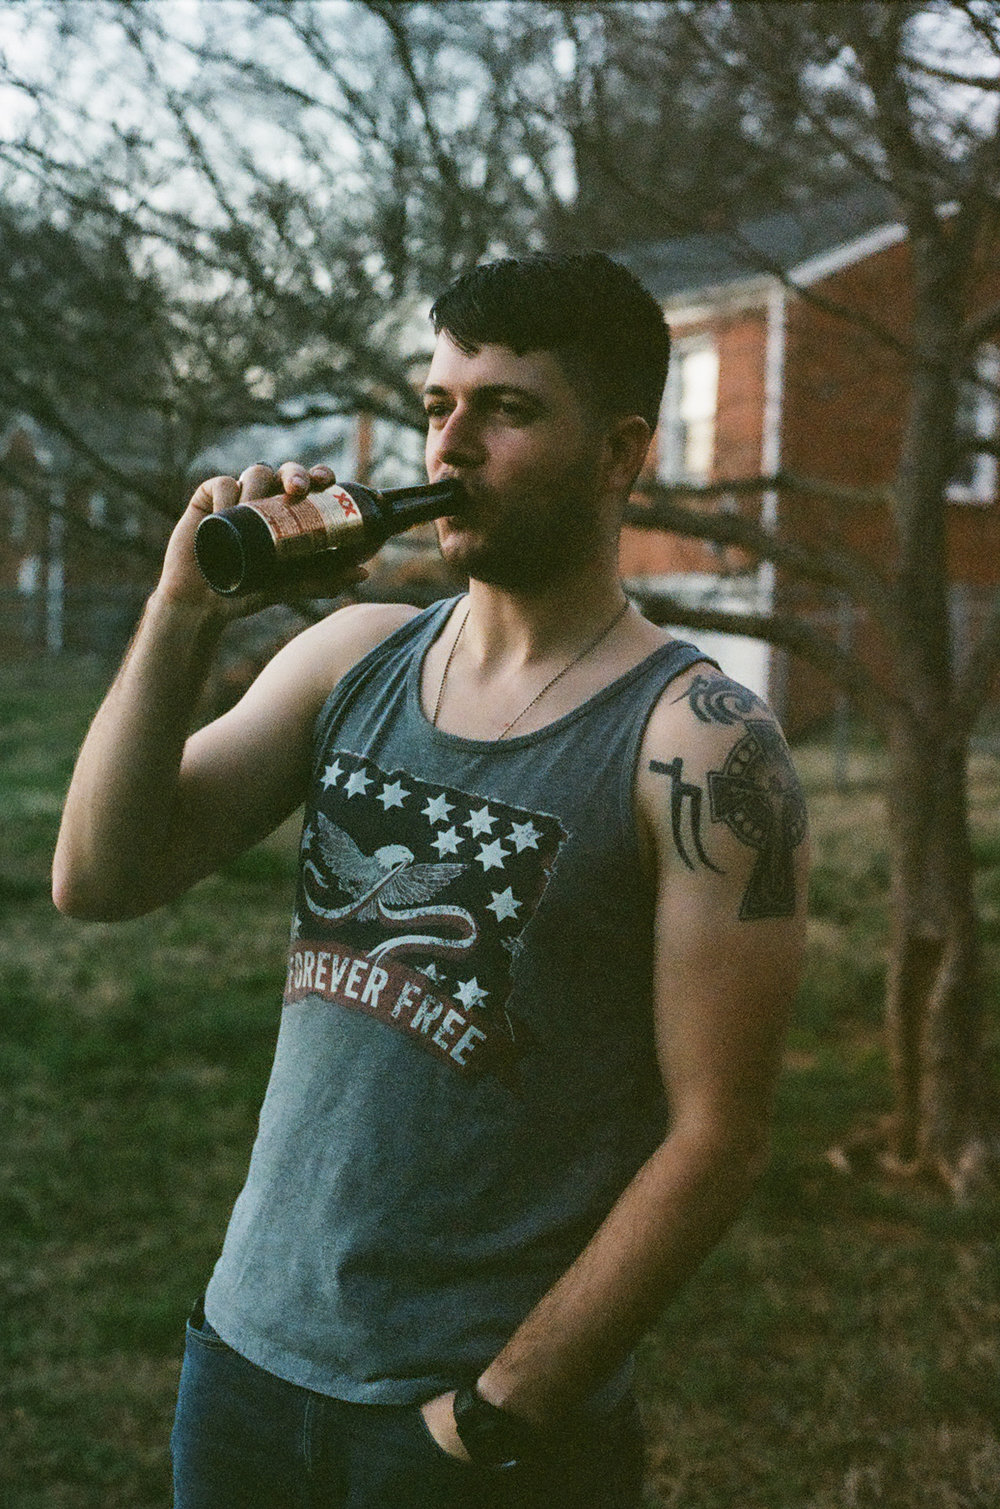 Charlotte-NC-man-drinking-beer